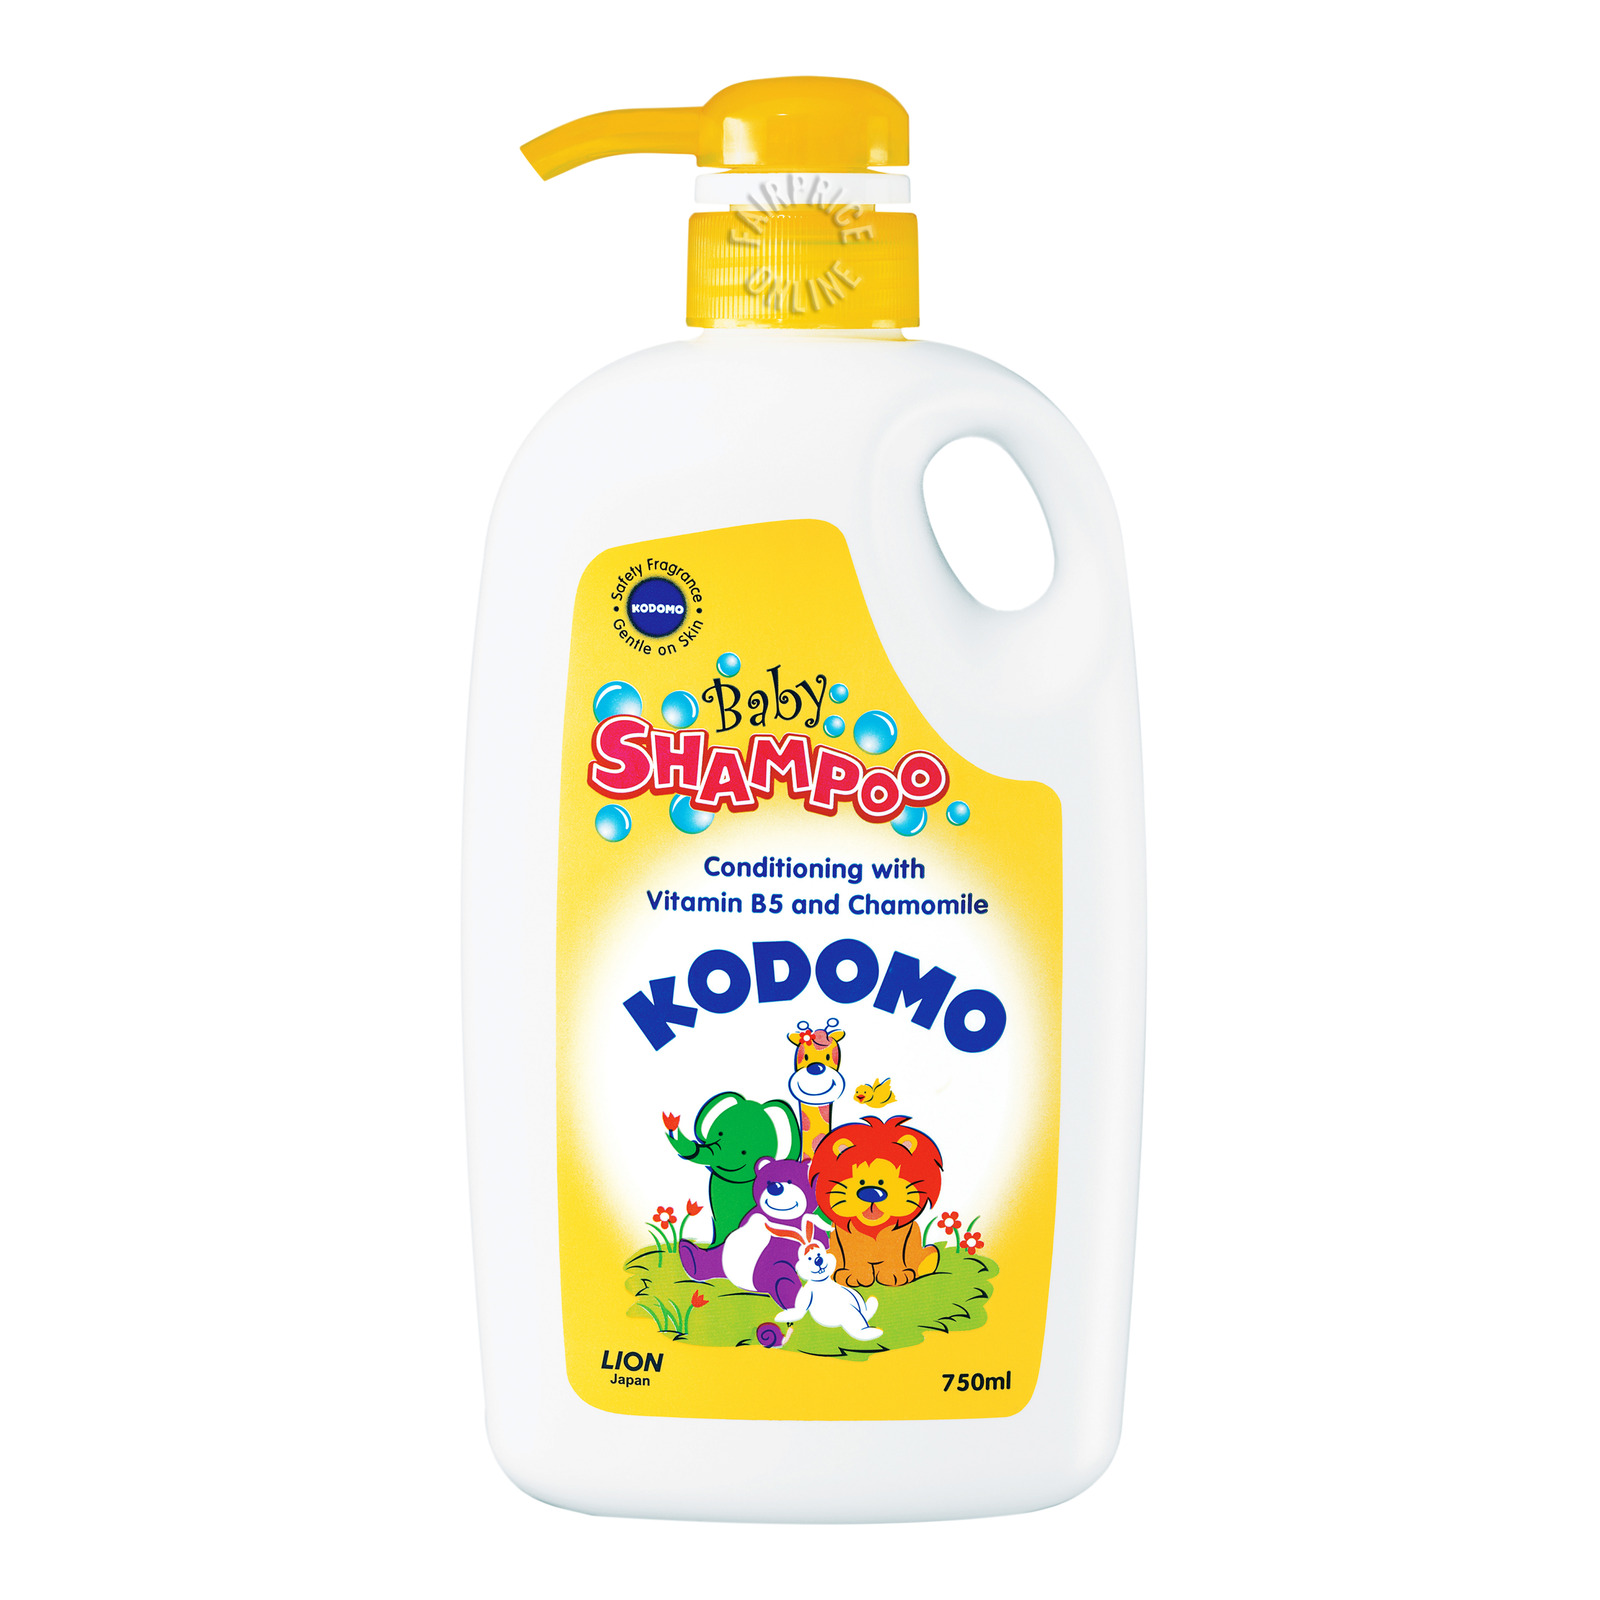 Kodomo Baby Shampoo (Conditioning) 750ML